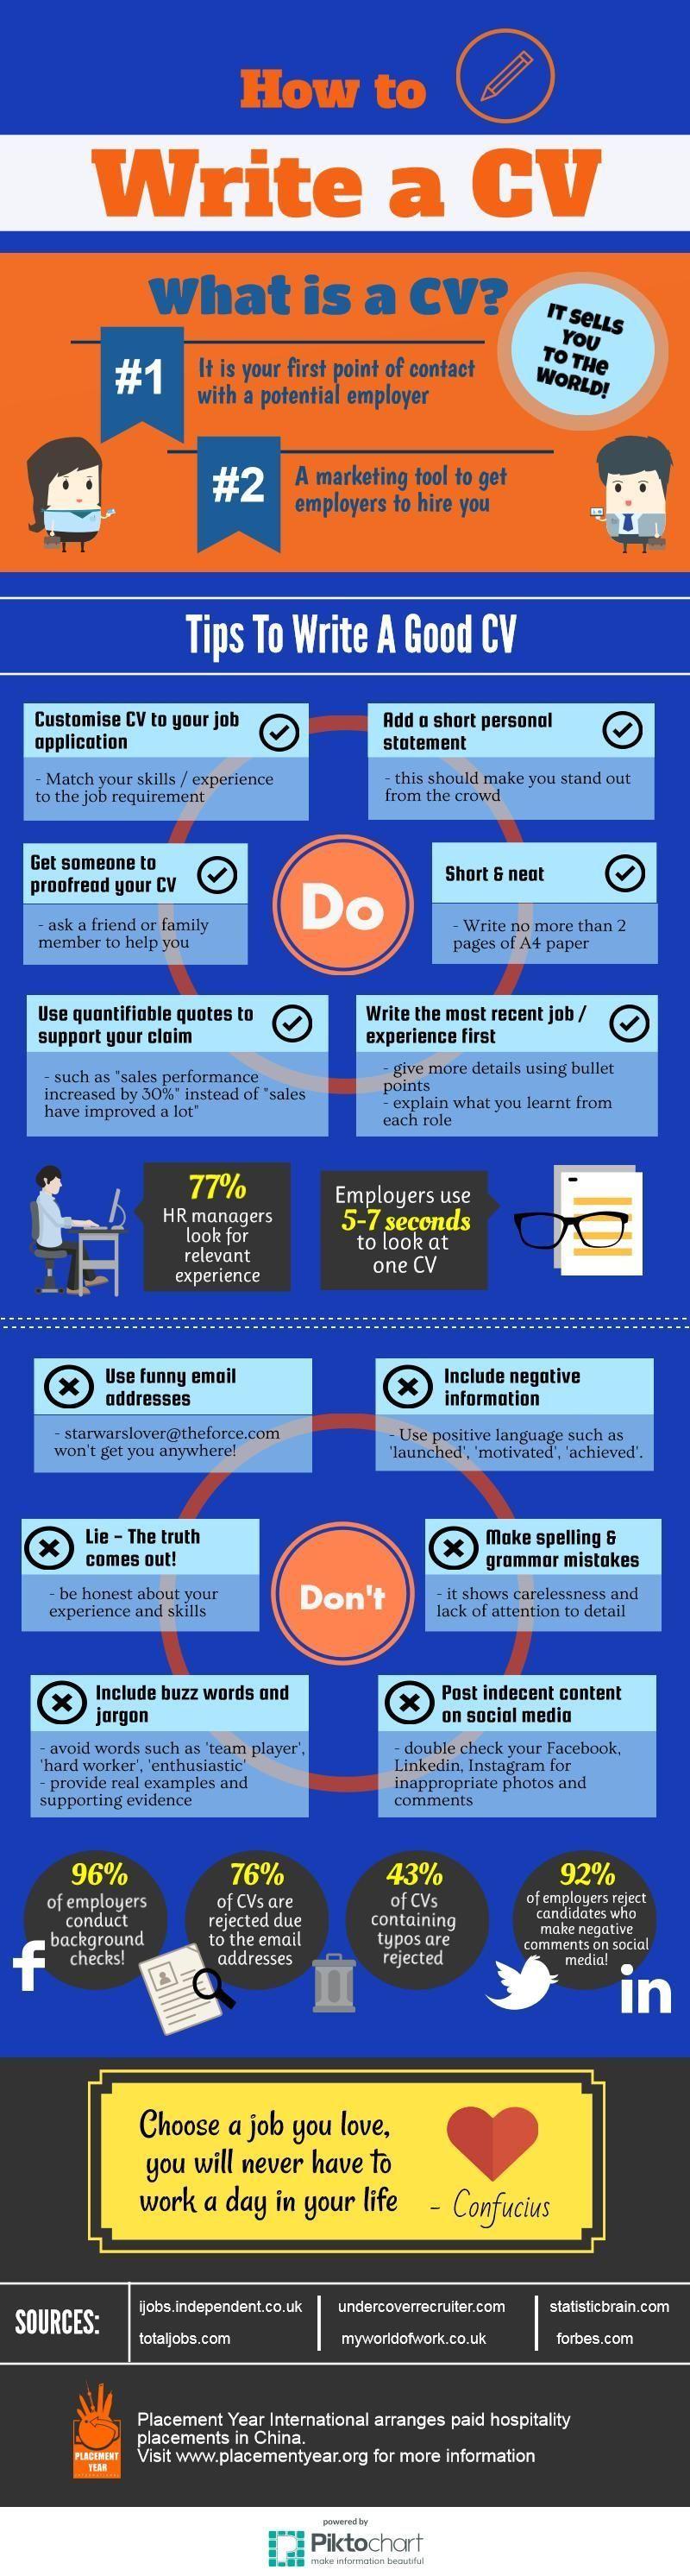 How to write a cv infographic career resume resumetips